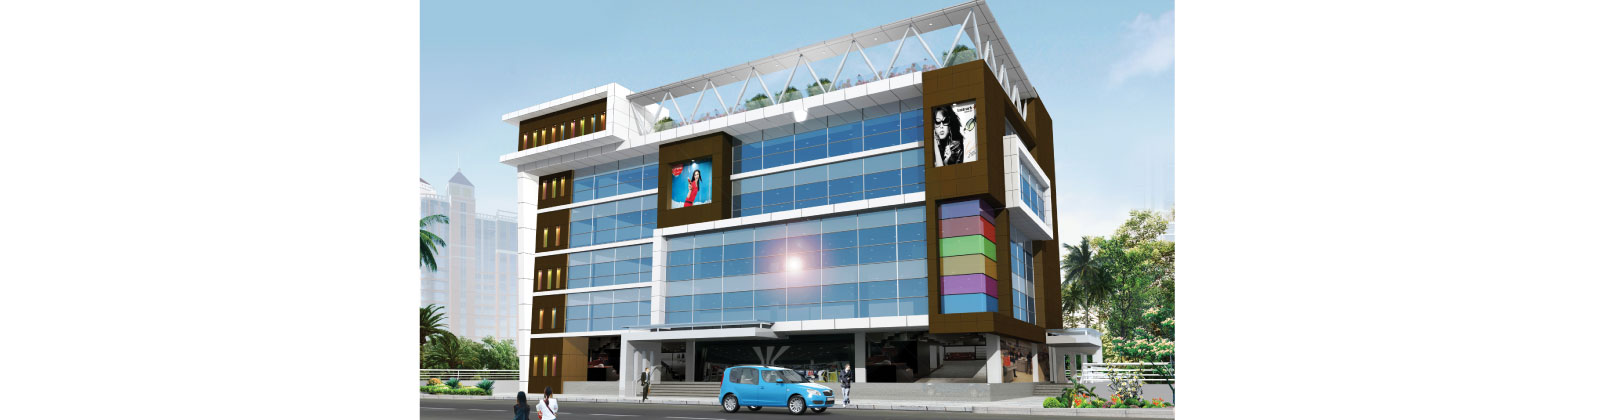 Sri Sai Constructions - Actual Image